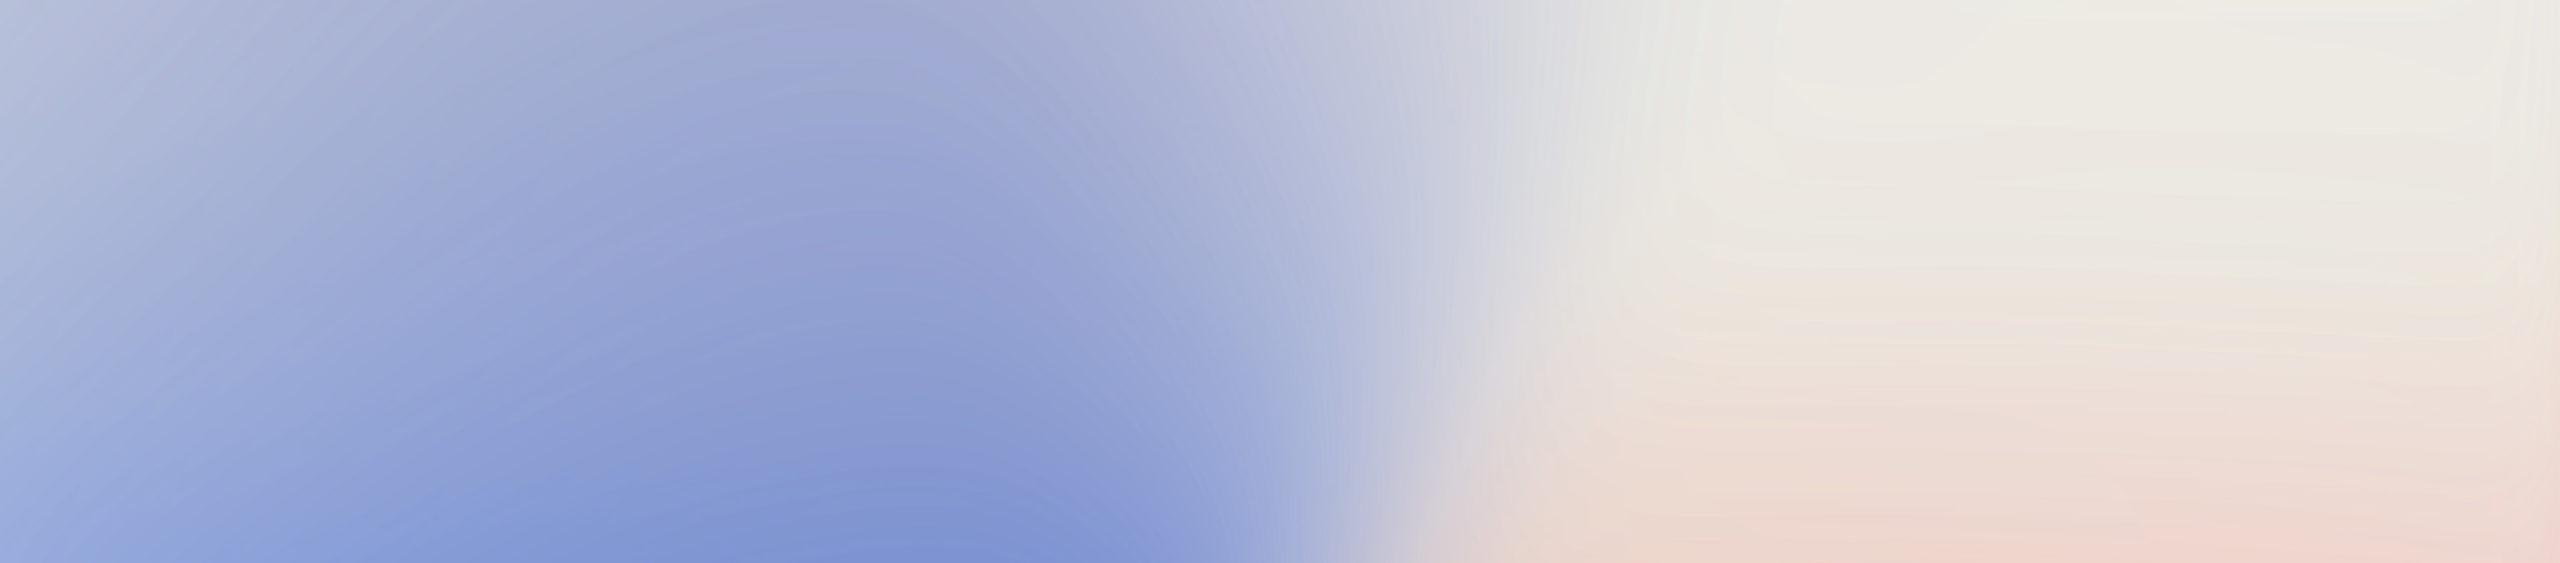 bluewhitegrad